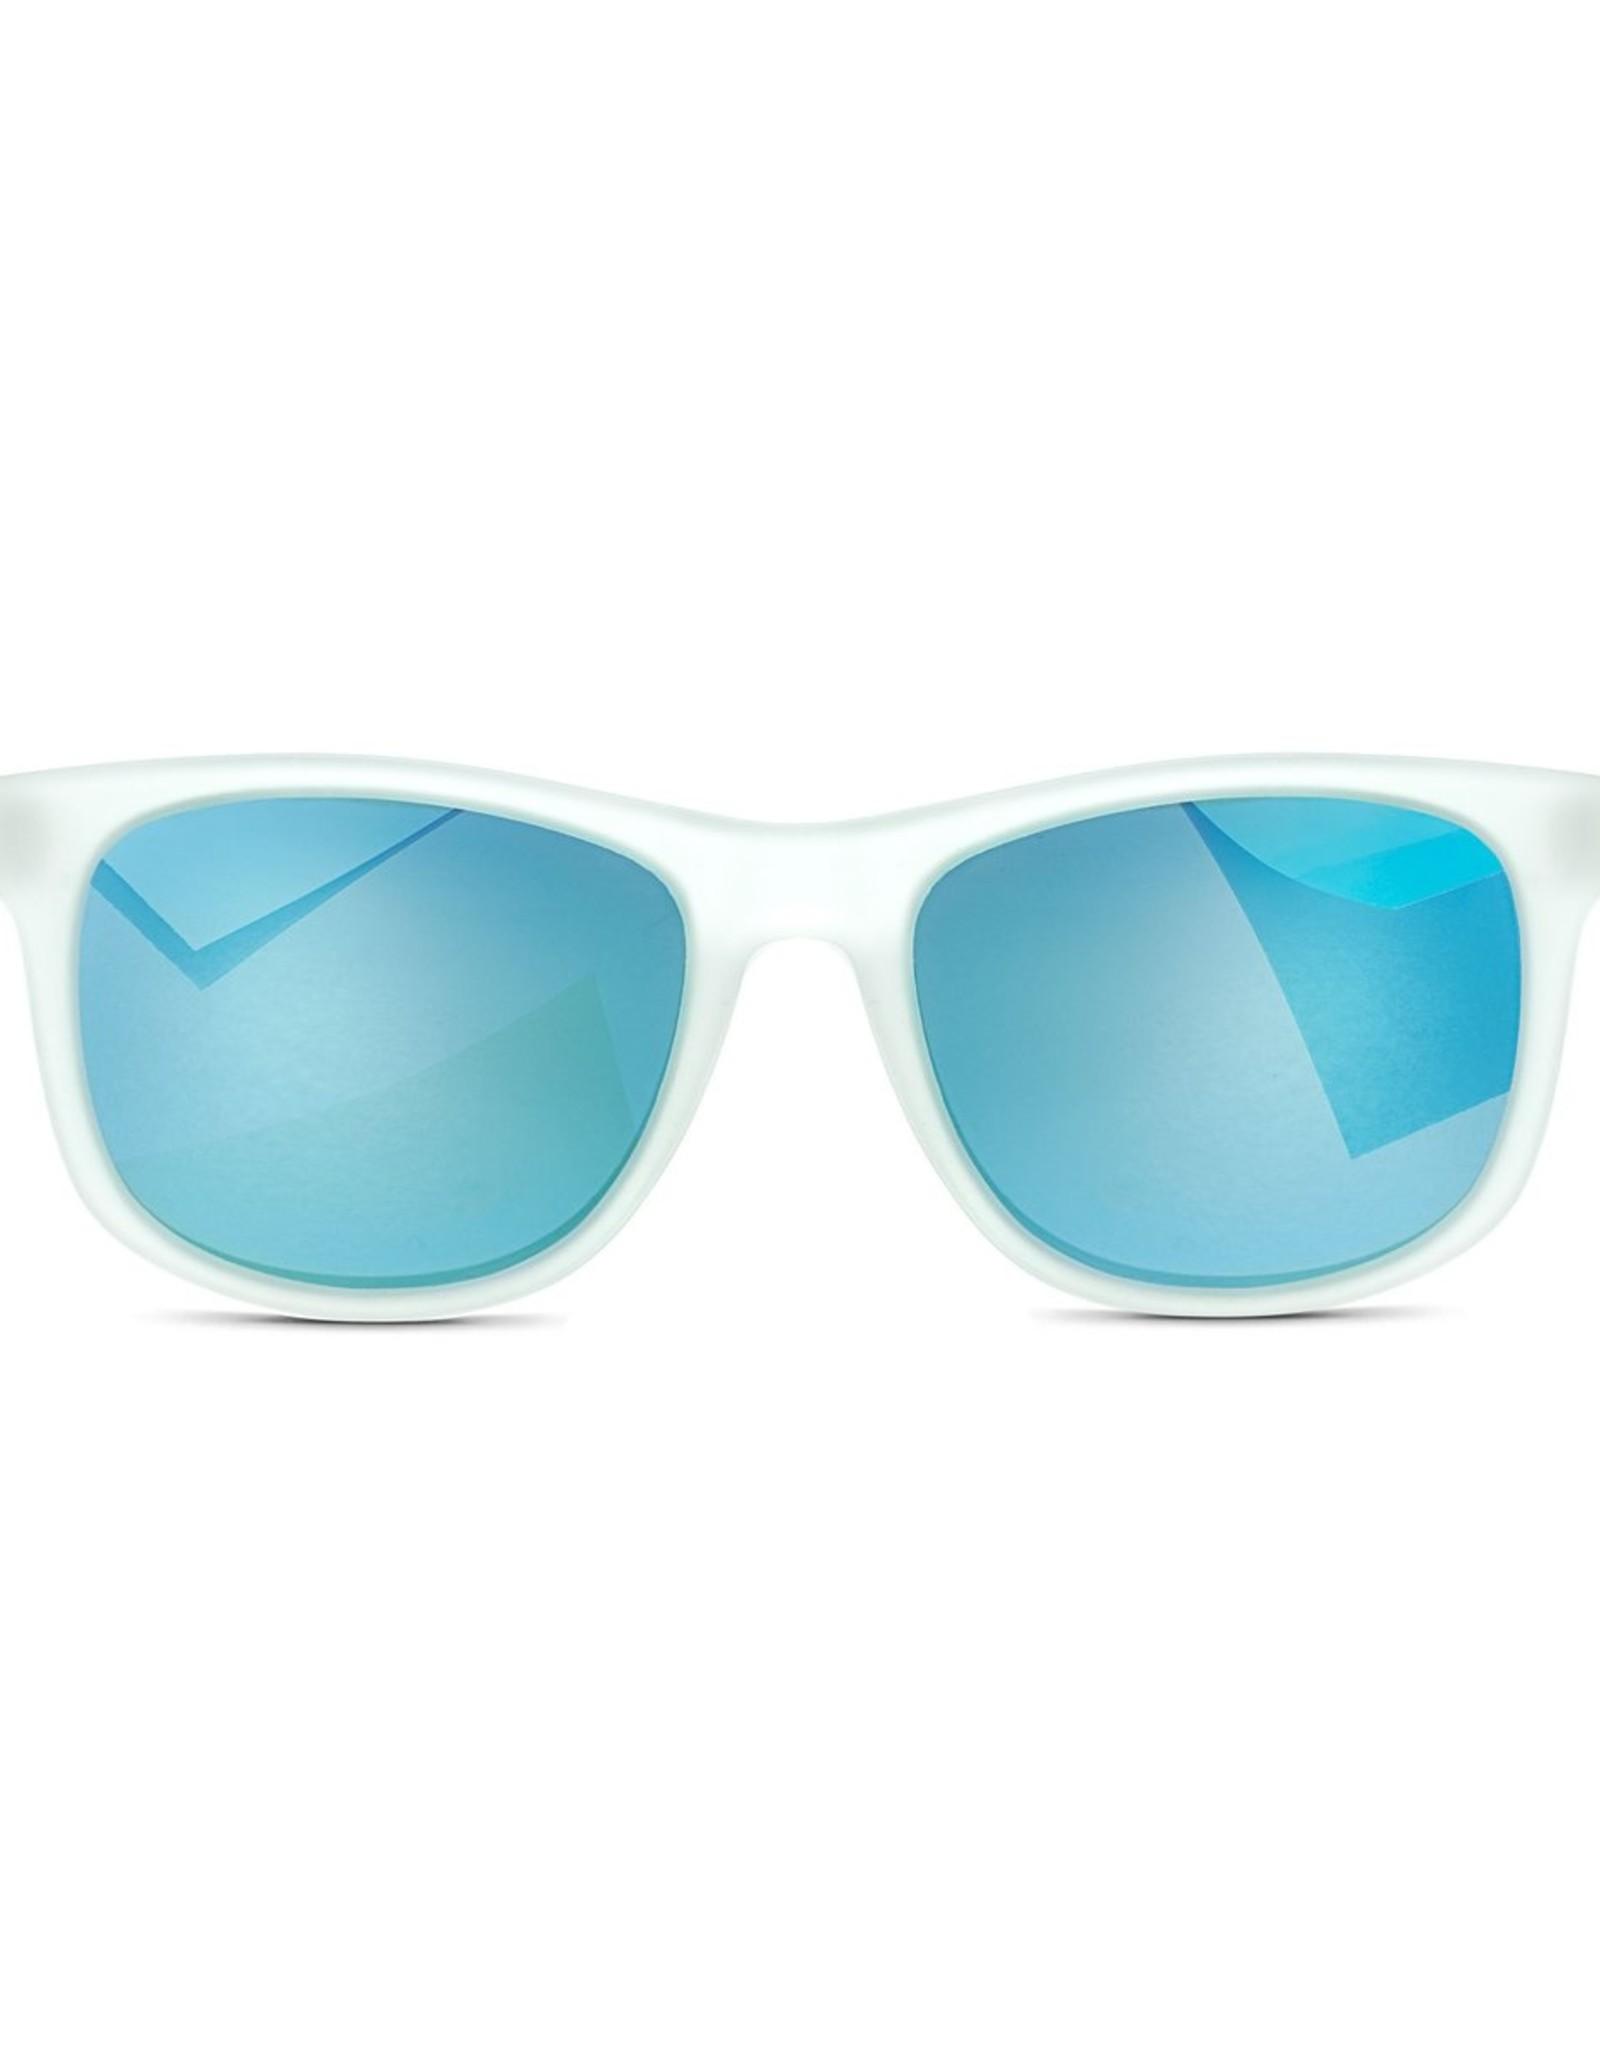 Hipsterkid Hipsterkid Wayfarers zonnebril frost